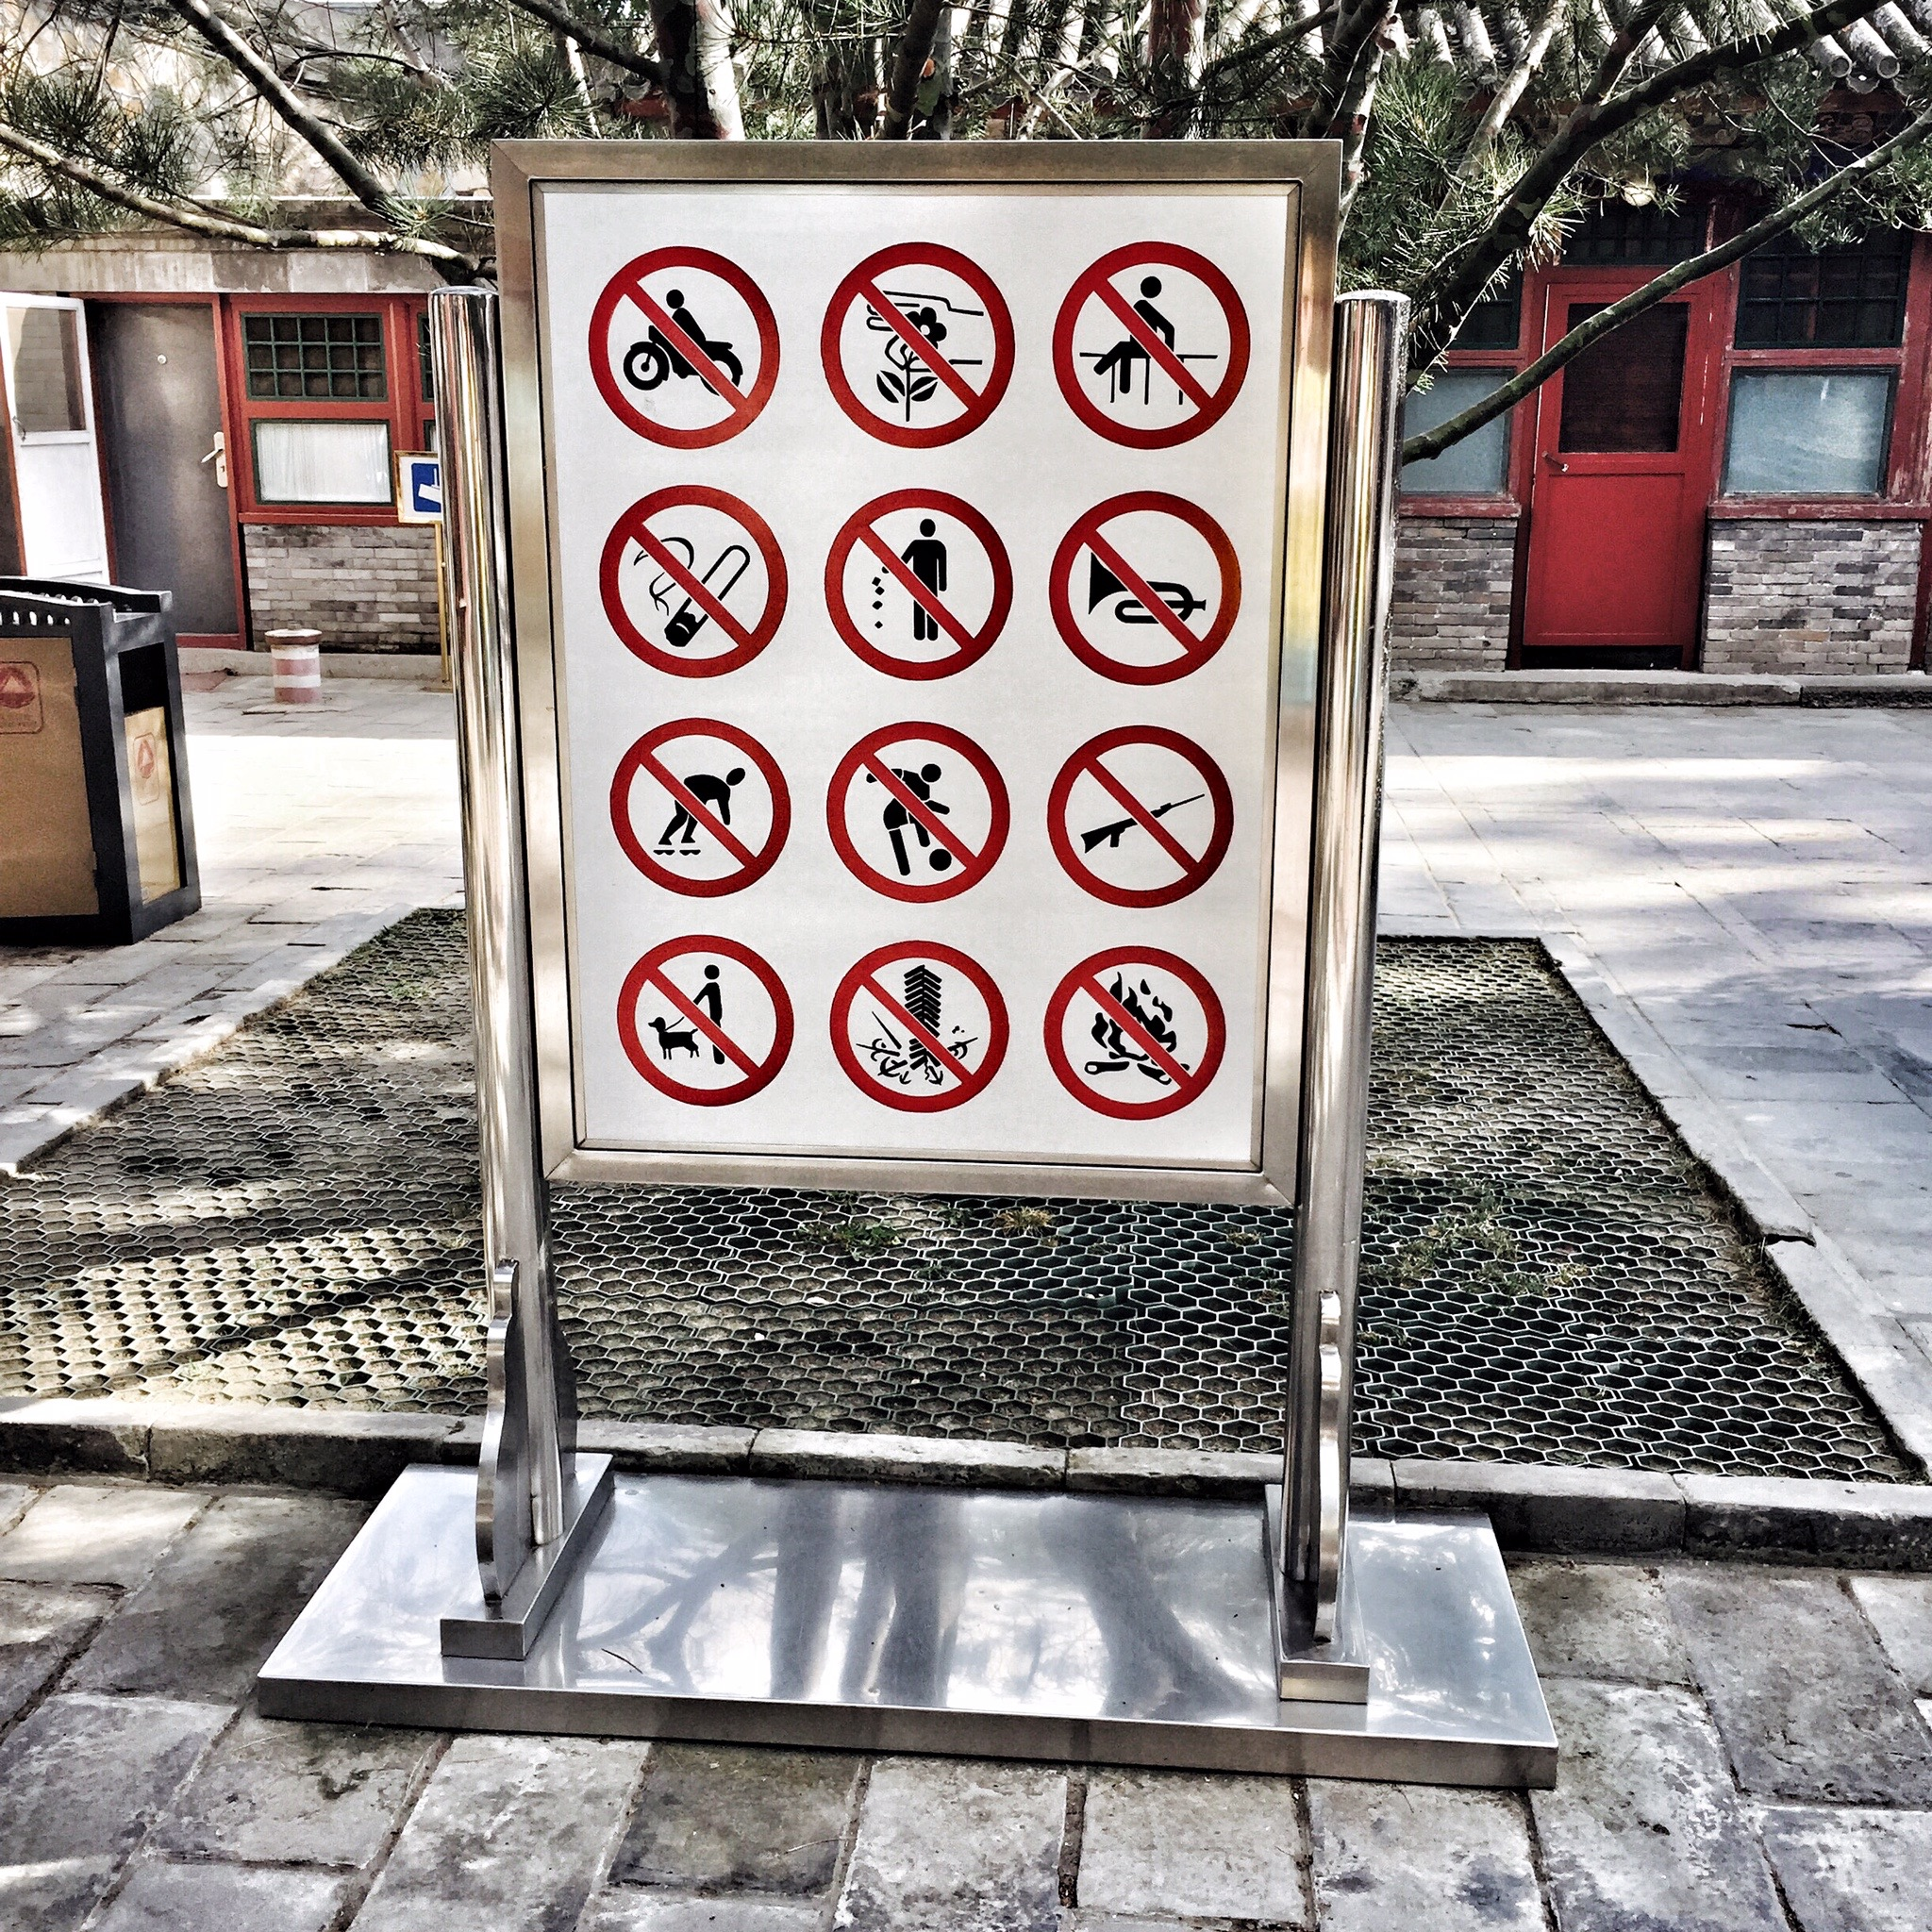 Bei Strafe verboten // Sommerpalast, Beijing